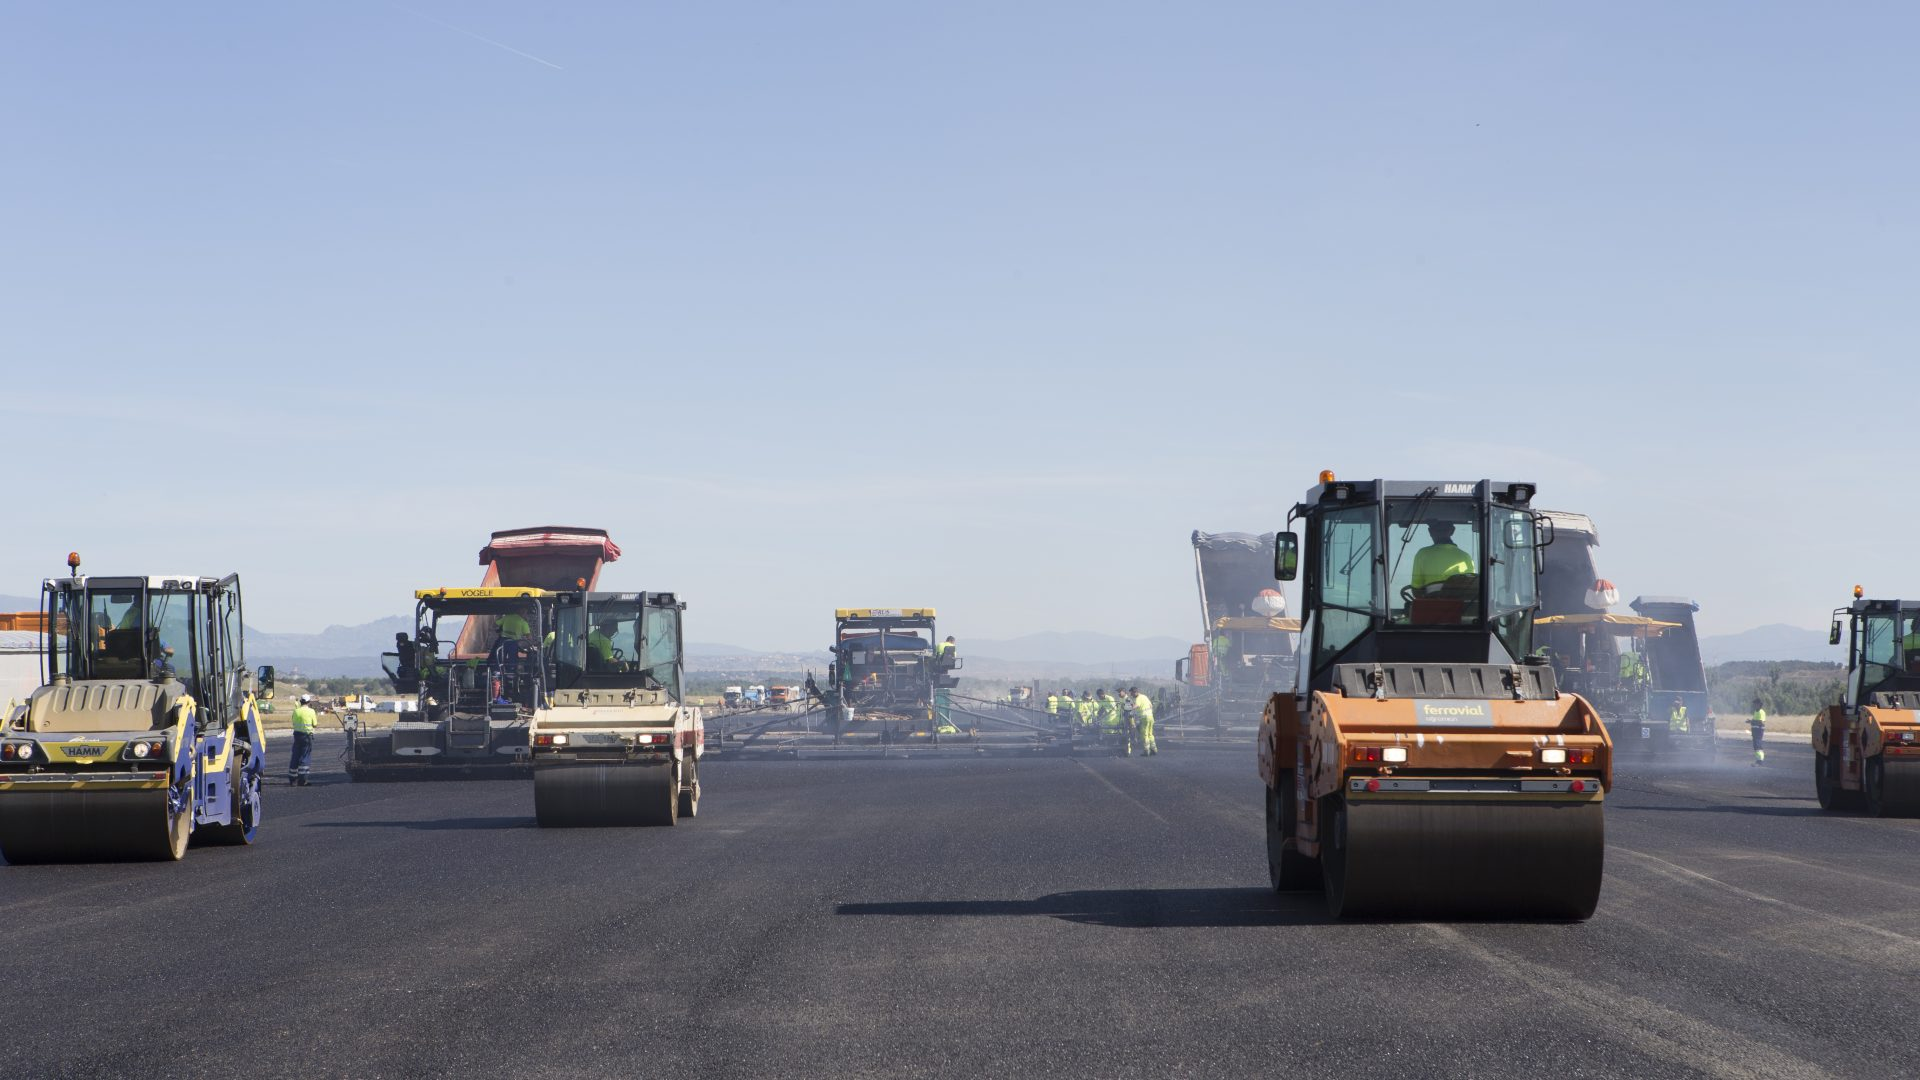 the regeneration of pavement of runway